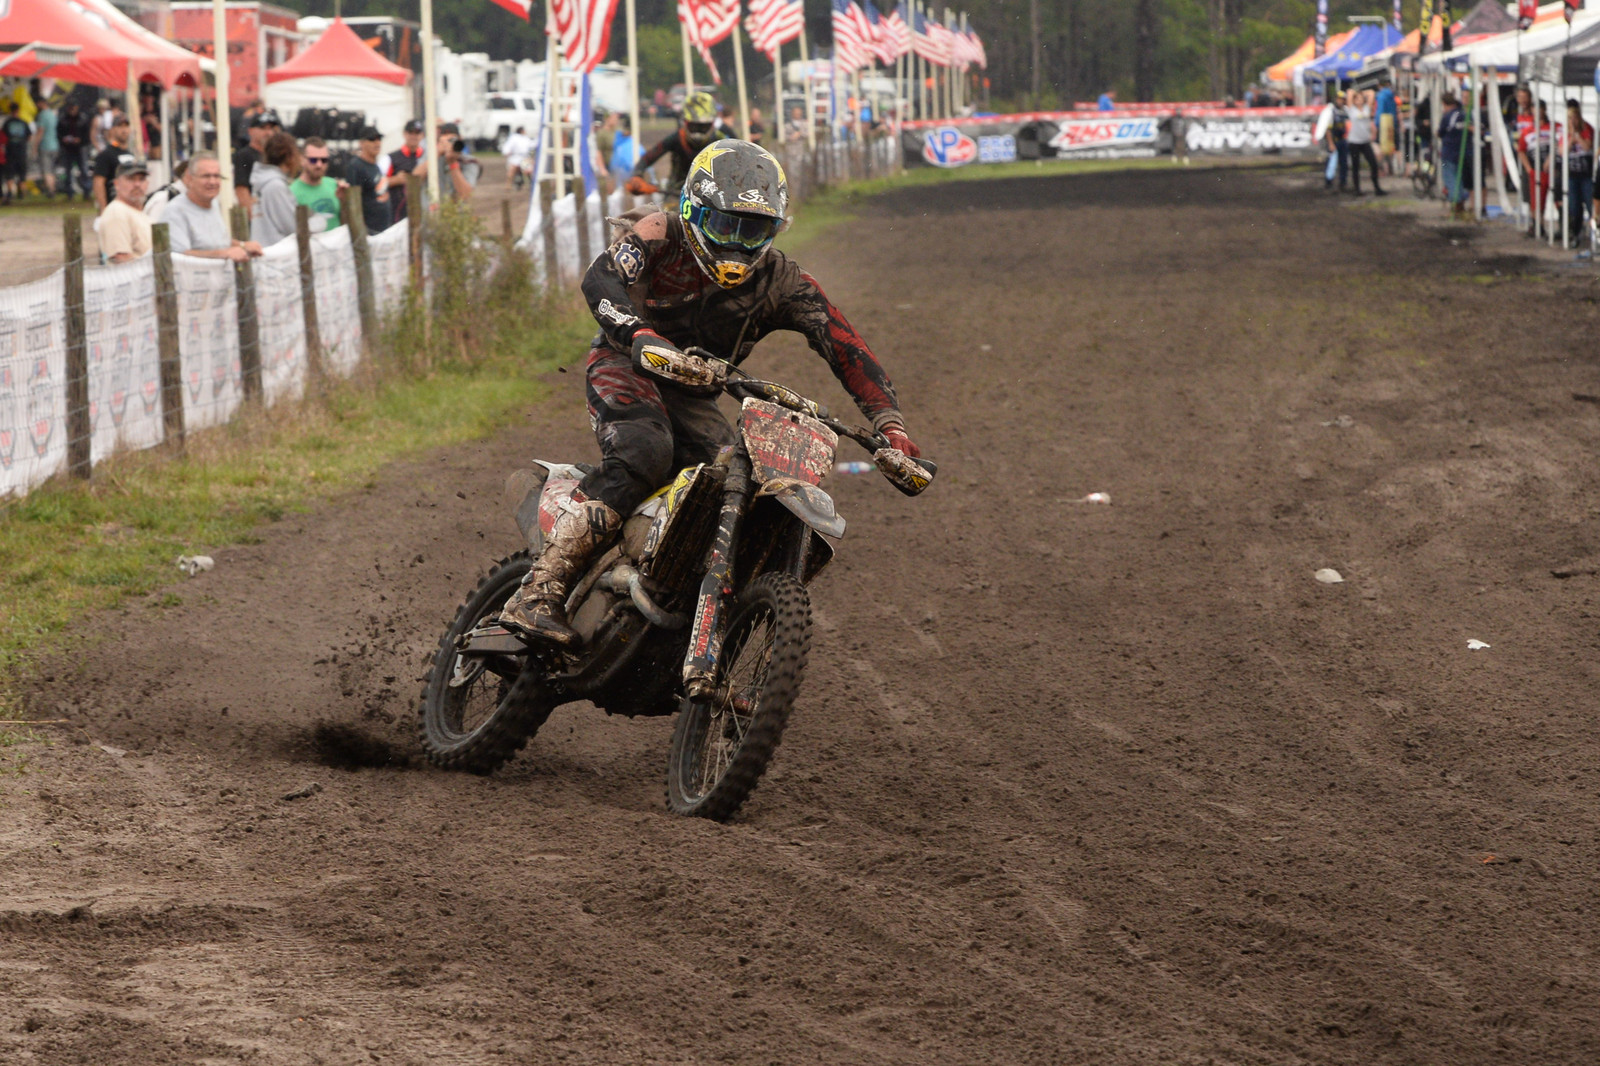 Thad Duvall - Wild Boar GNCC - Motocross Pictures - Vital MX